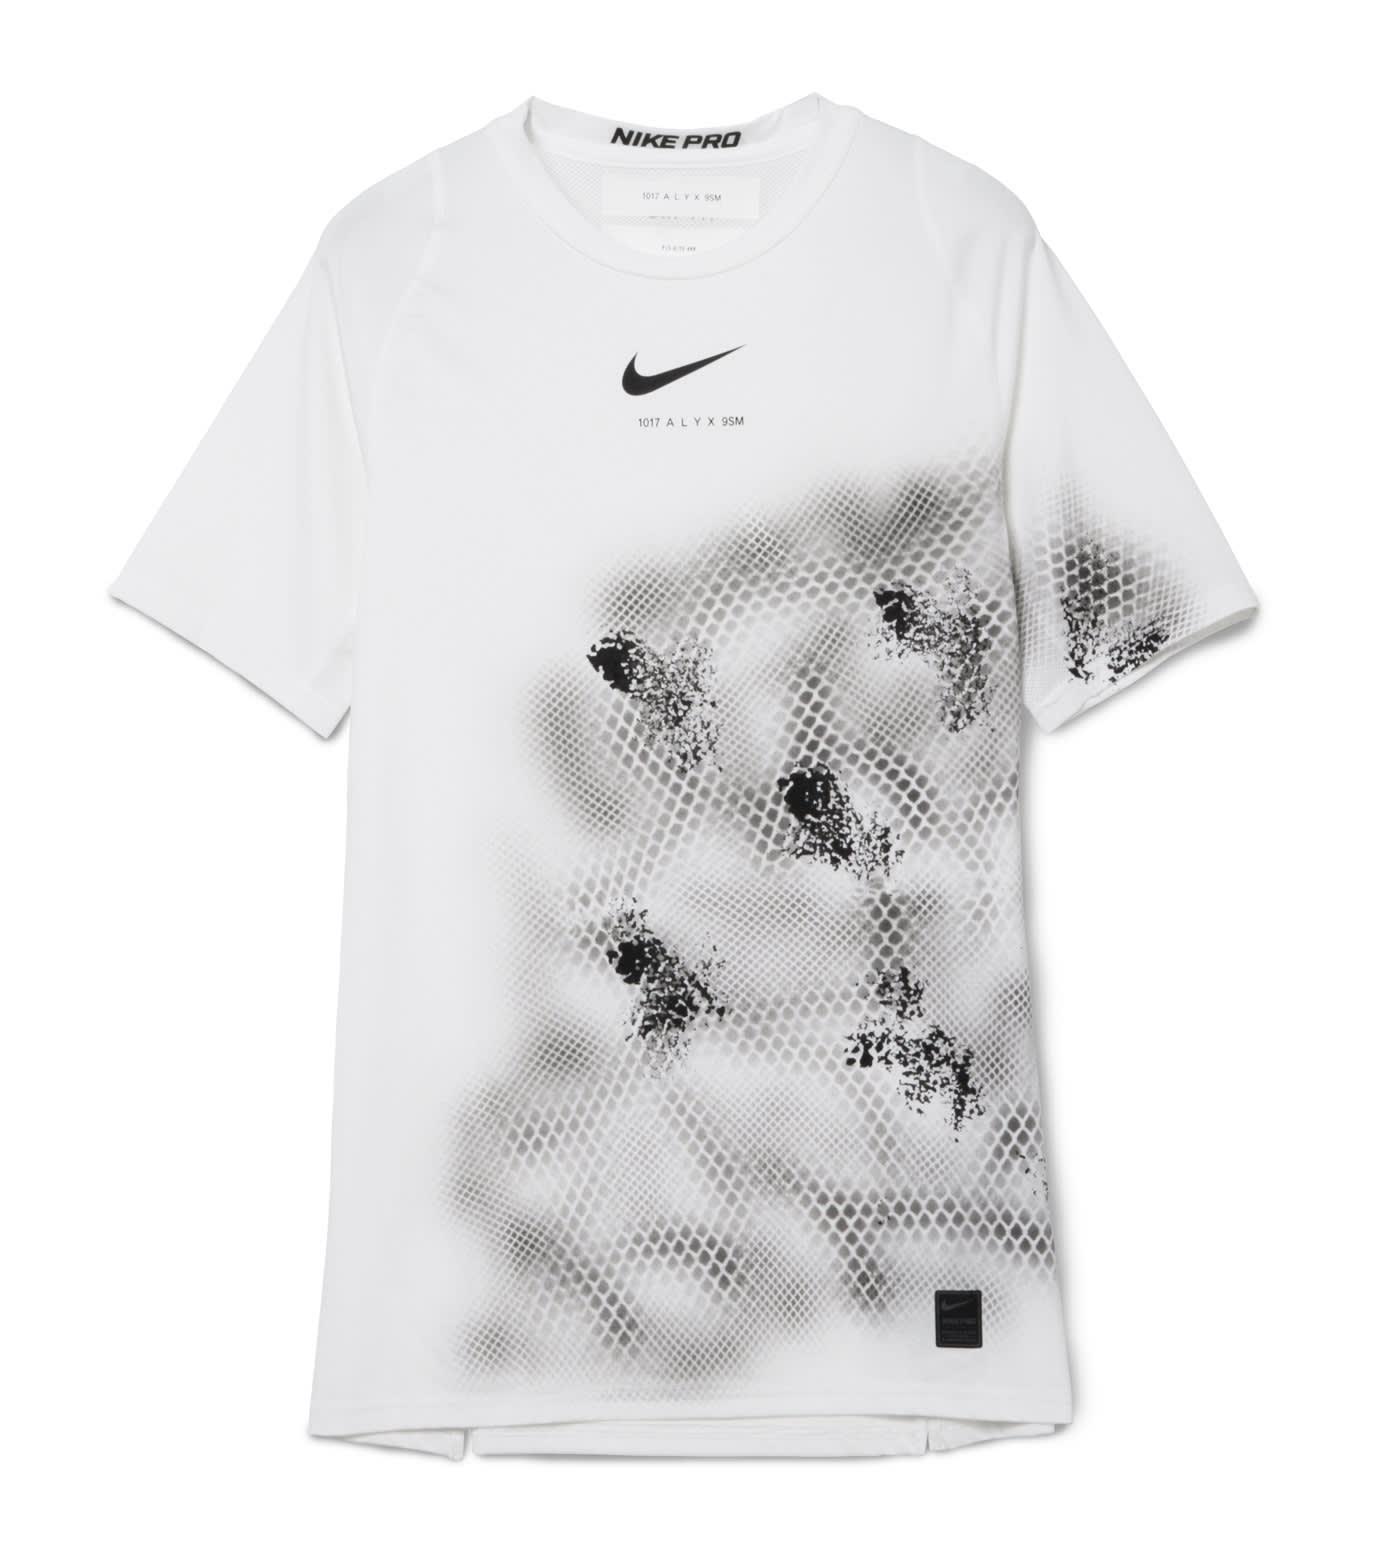 1017 ALYX 9 SM Restir Exclusive Nike Dri Fit Tee